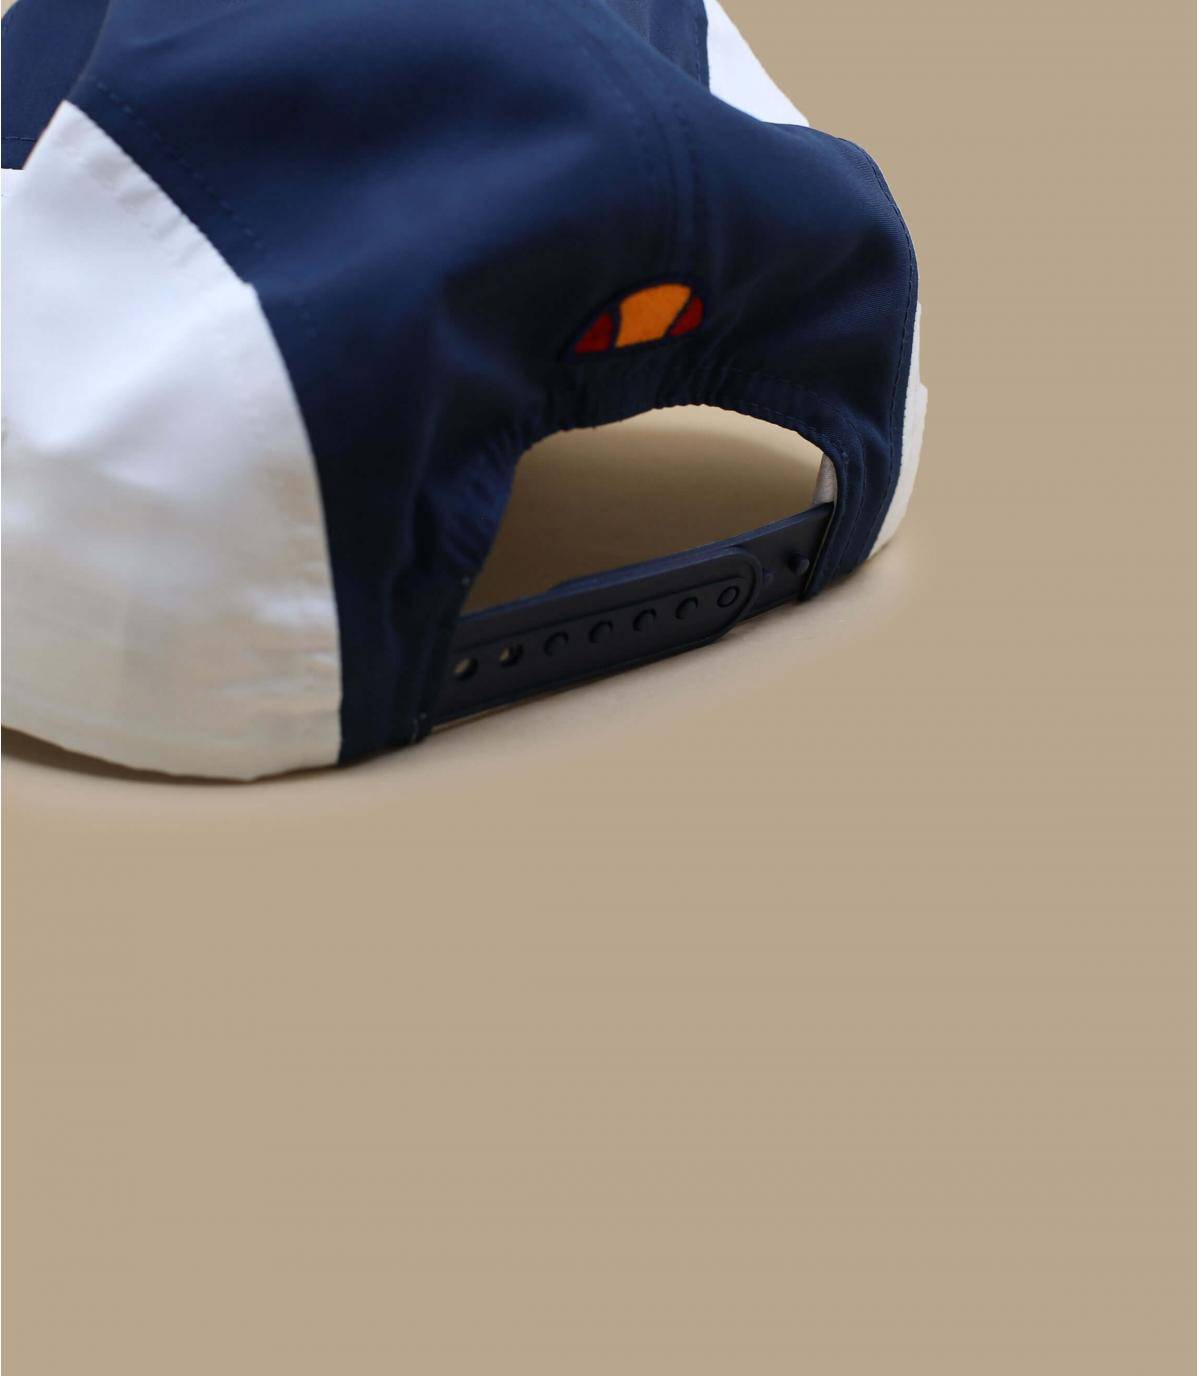 Details Maffeo orange - Abbildung 3